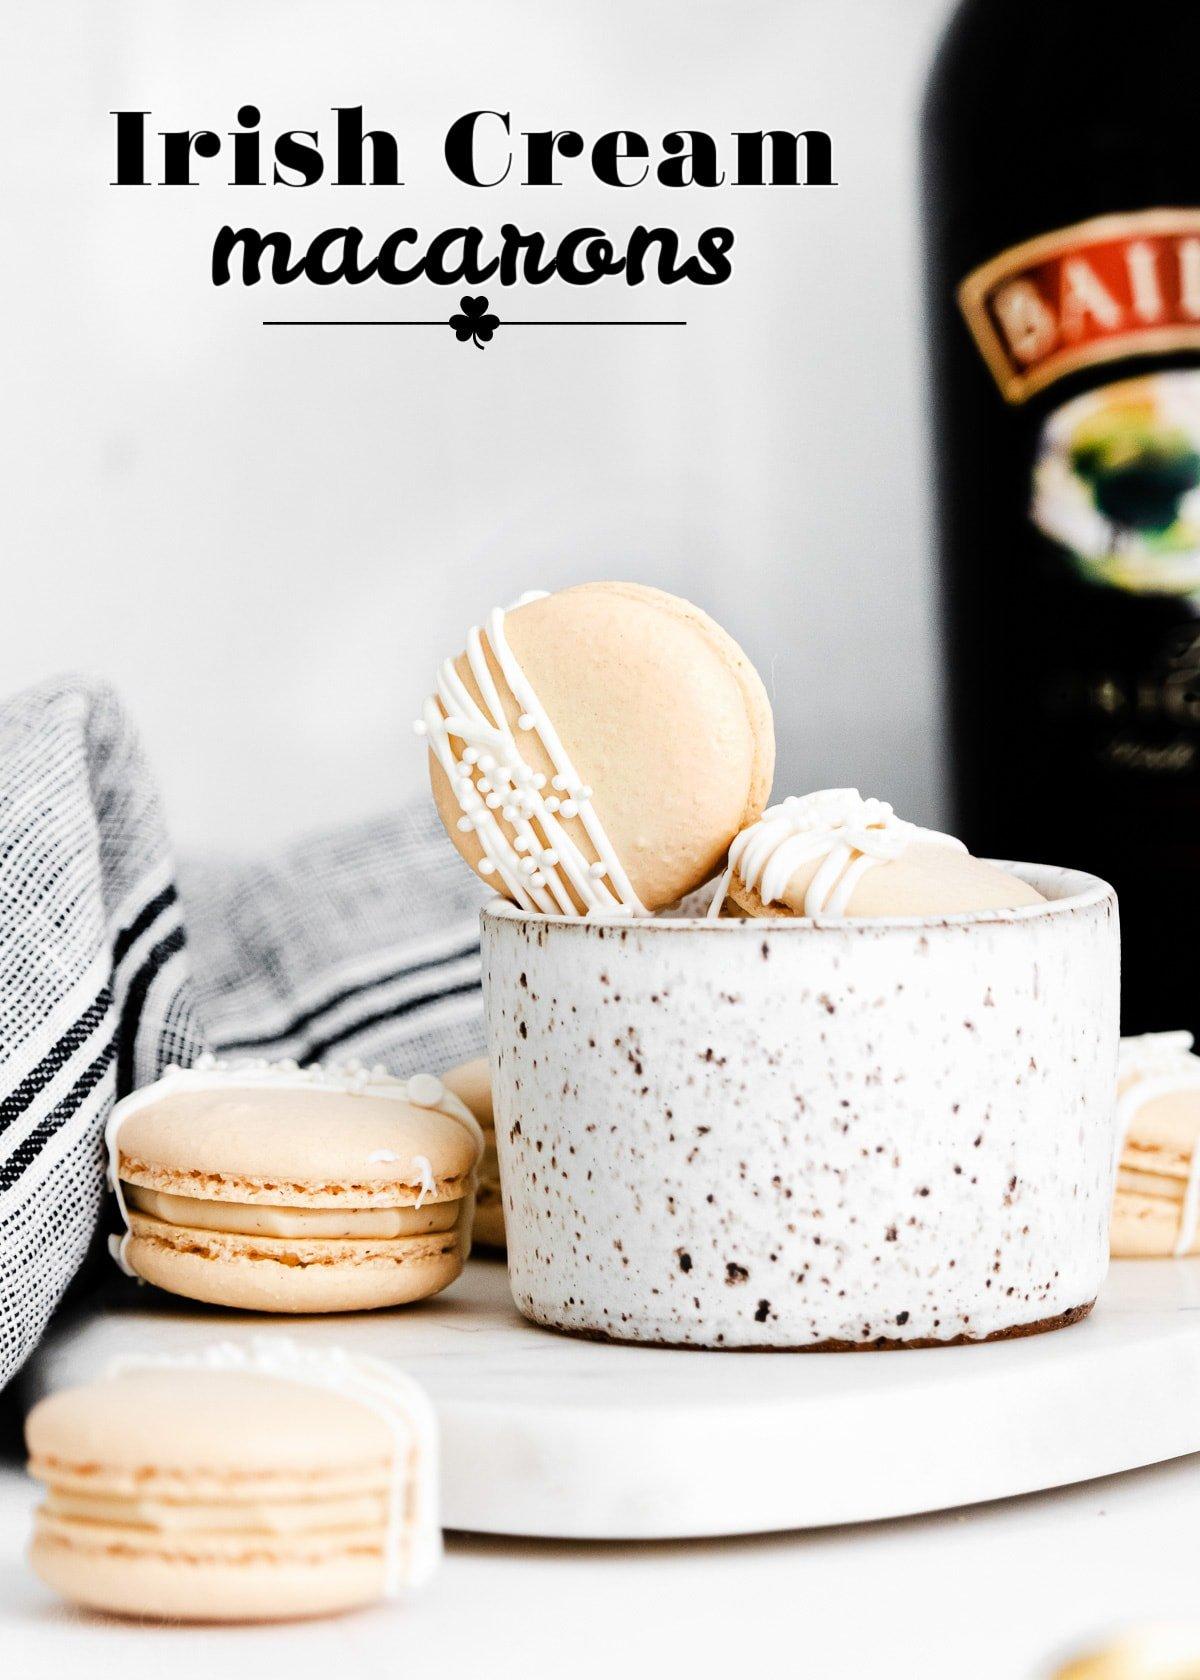 irish cream macarons next to bottle of baileys with title overlay.